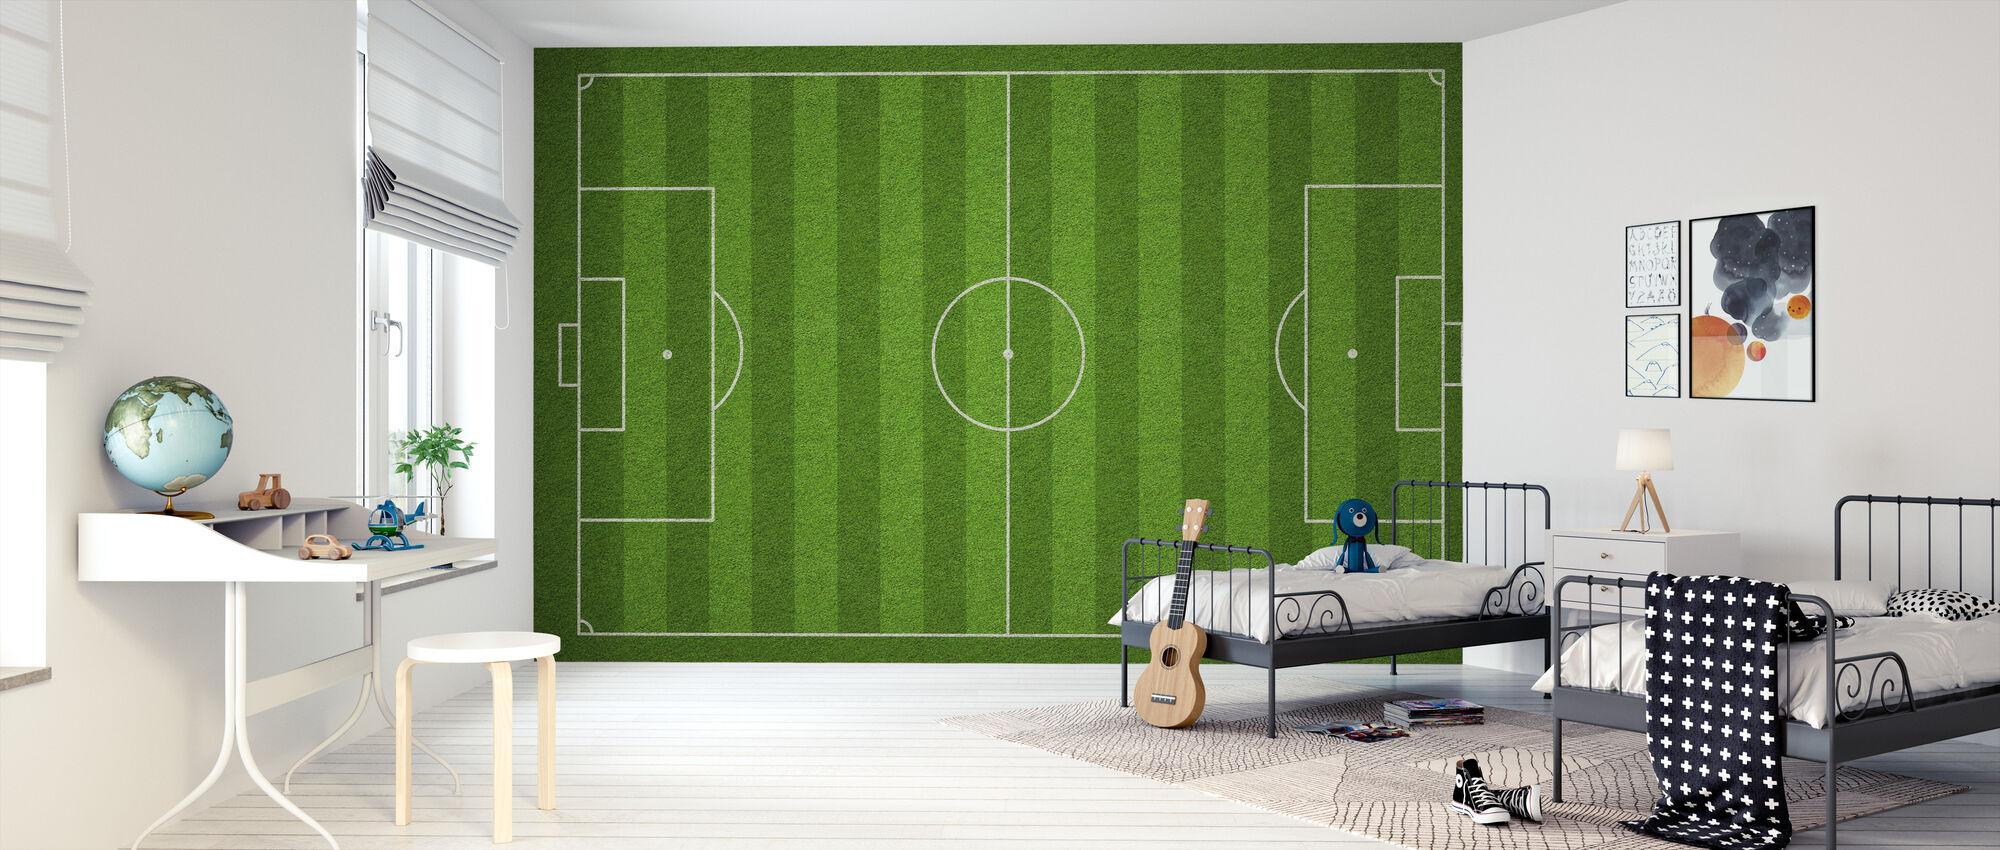 Football Field - Wallpaper - Kids Room